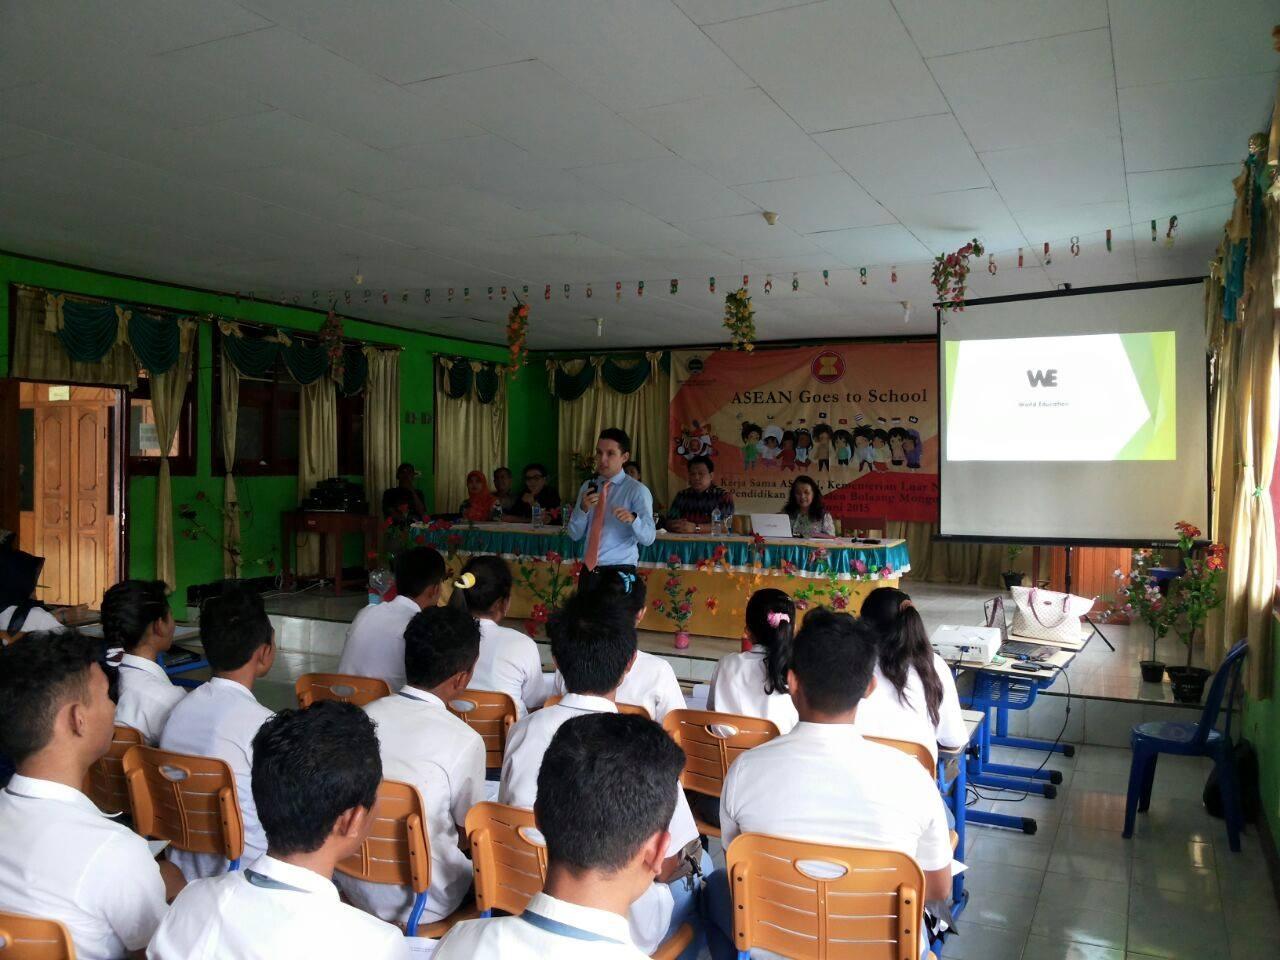 ASEAN Goes to School 2